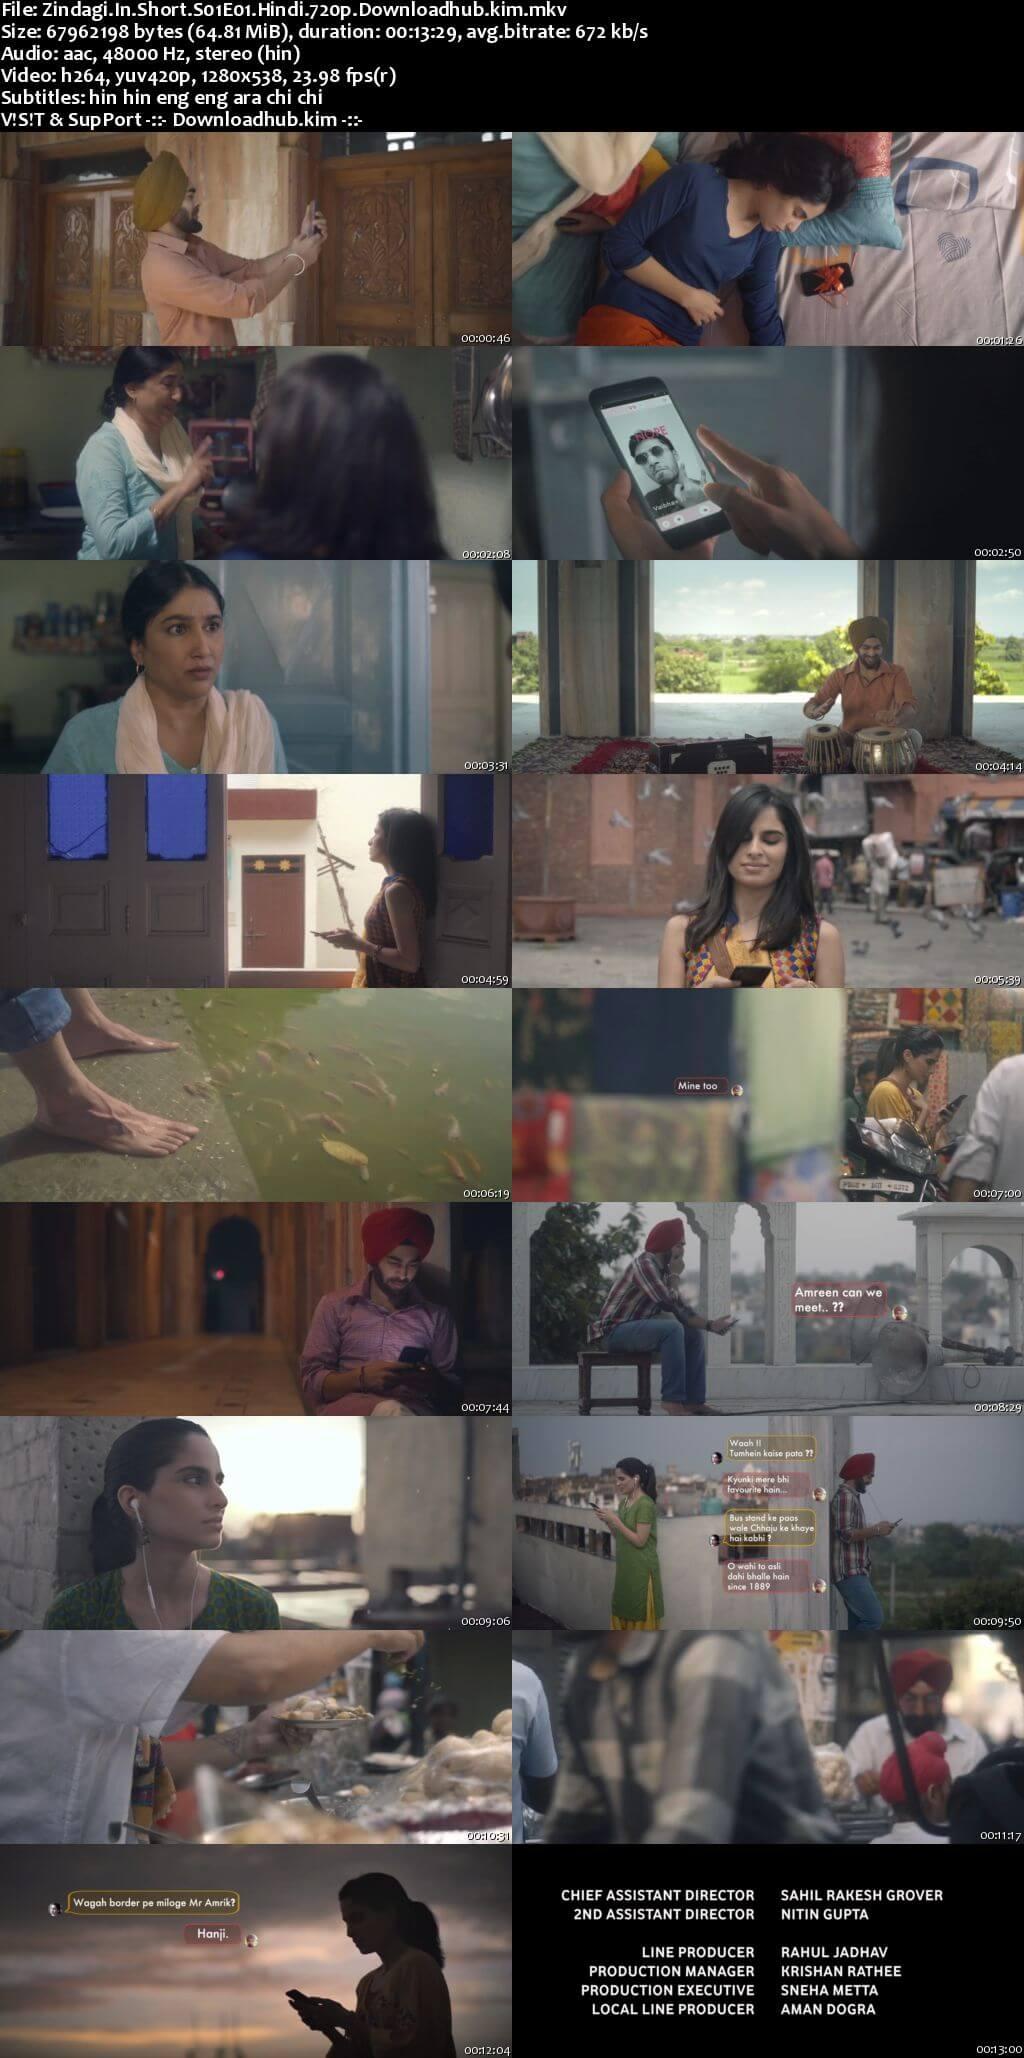 Zindagi In Short 2020 Hindi Season 01 Complete 720p HDRip MSubs